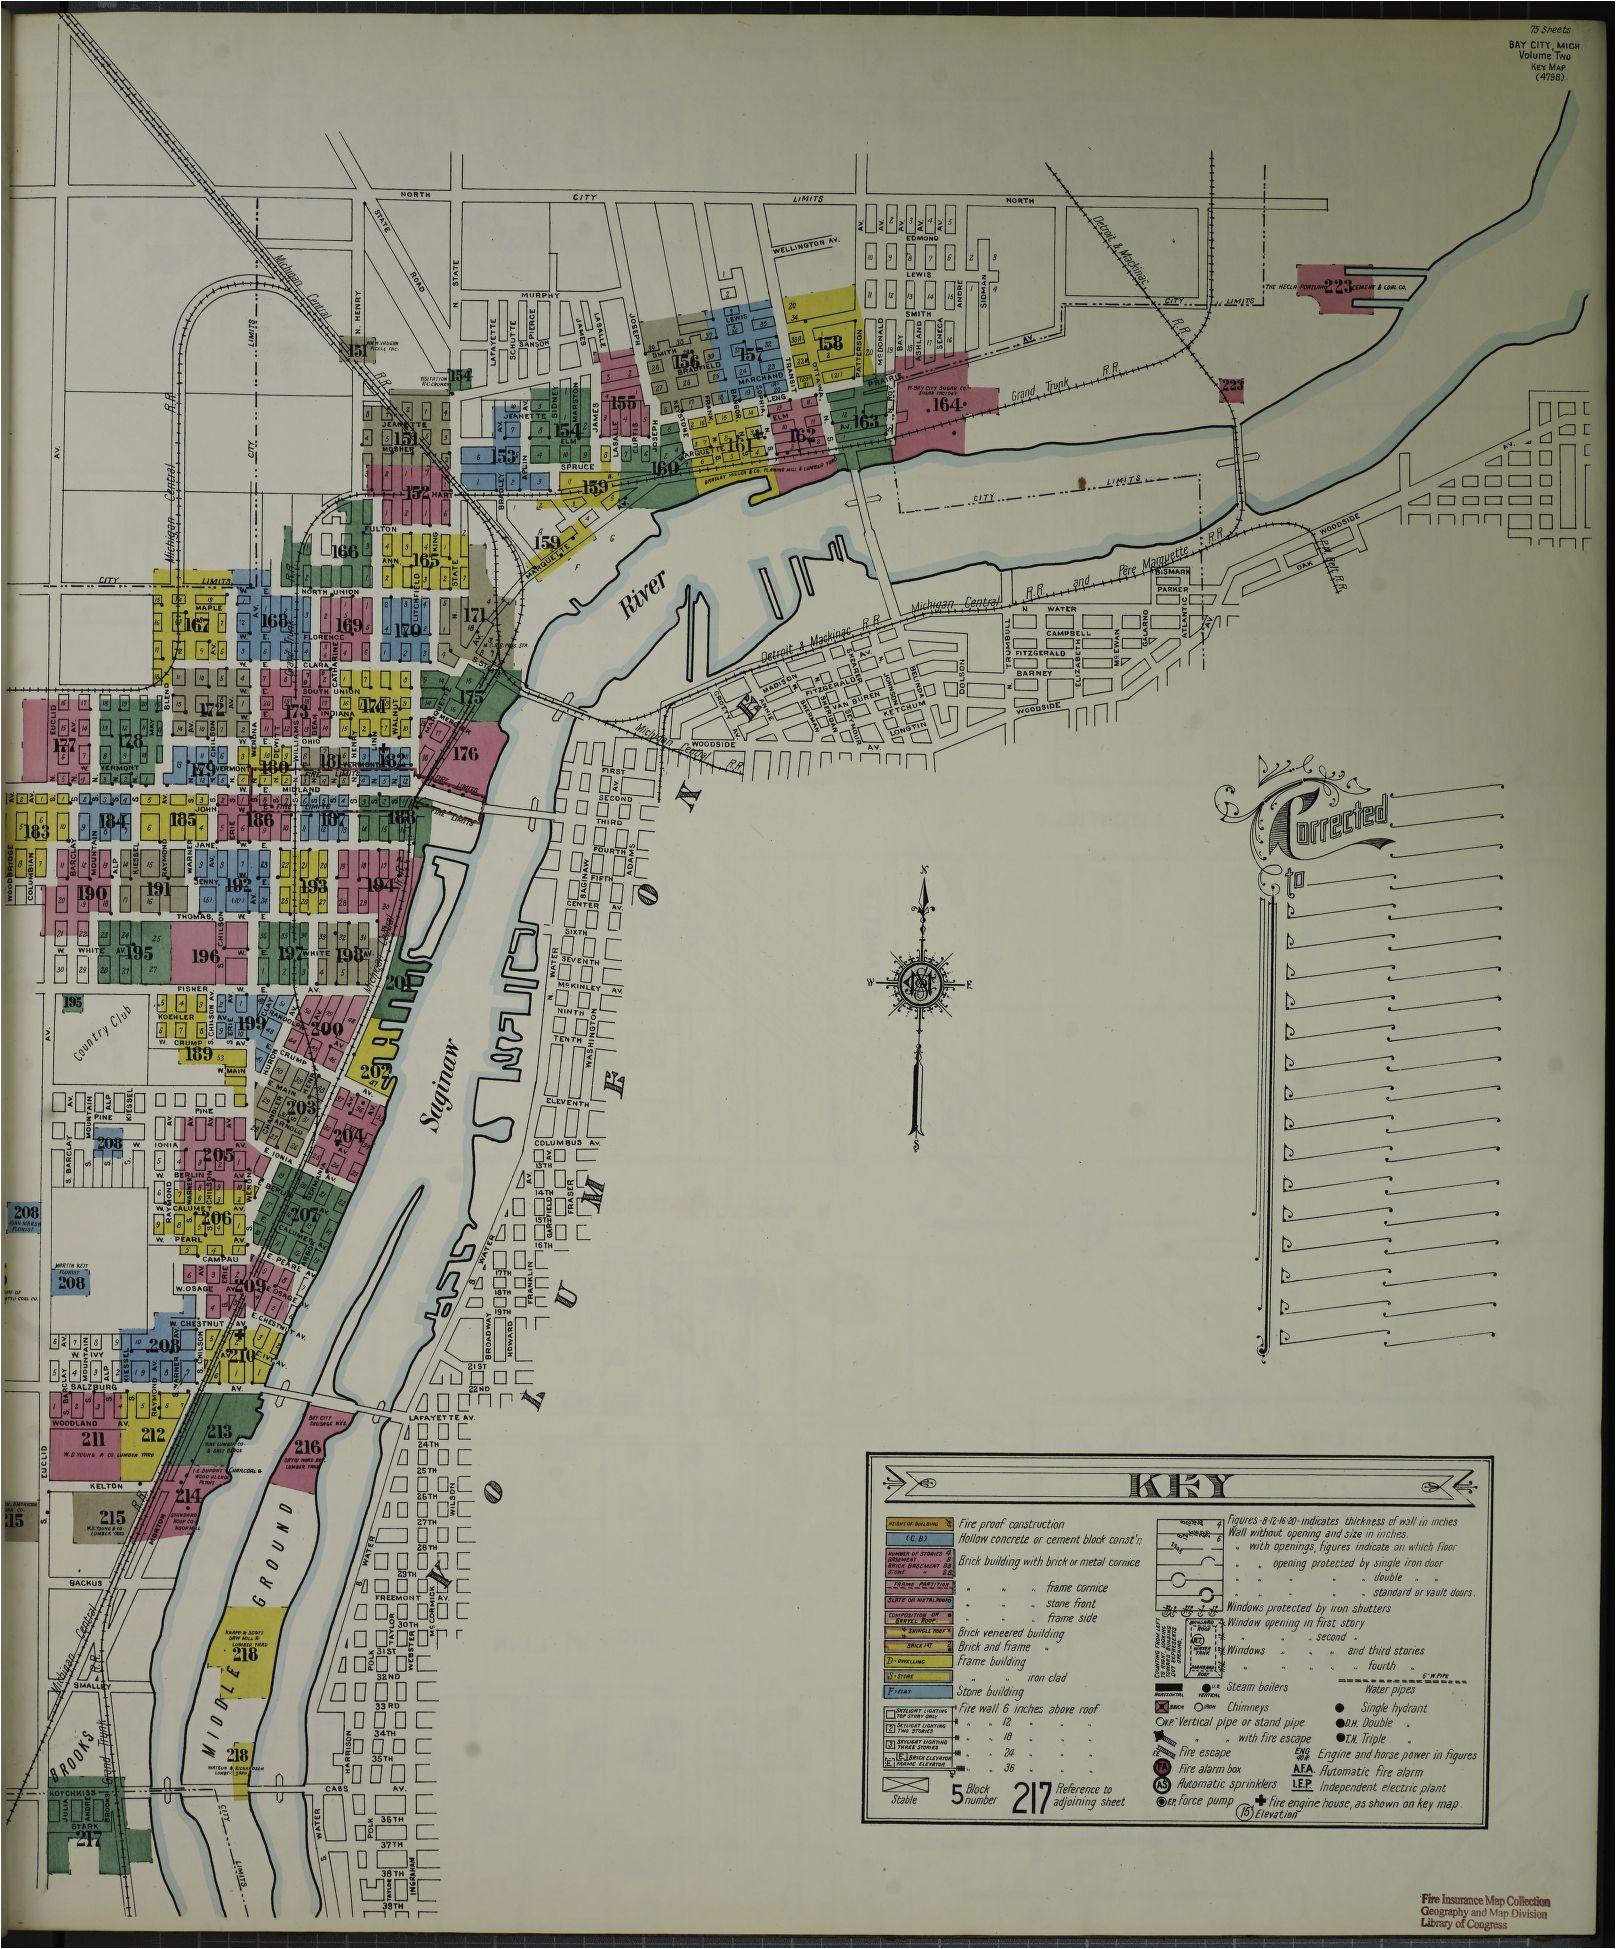 Michigan County Plat Maps Schoolcraft County Michigan Plat Map Luxury Map Michigan Ny County Map